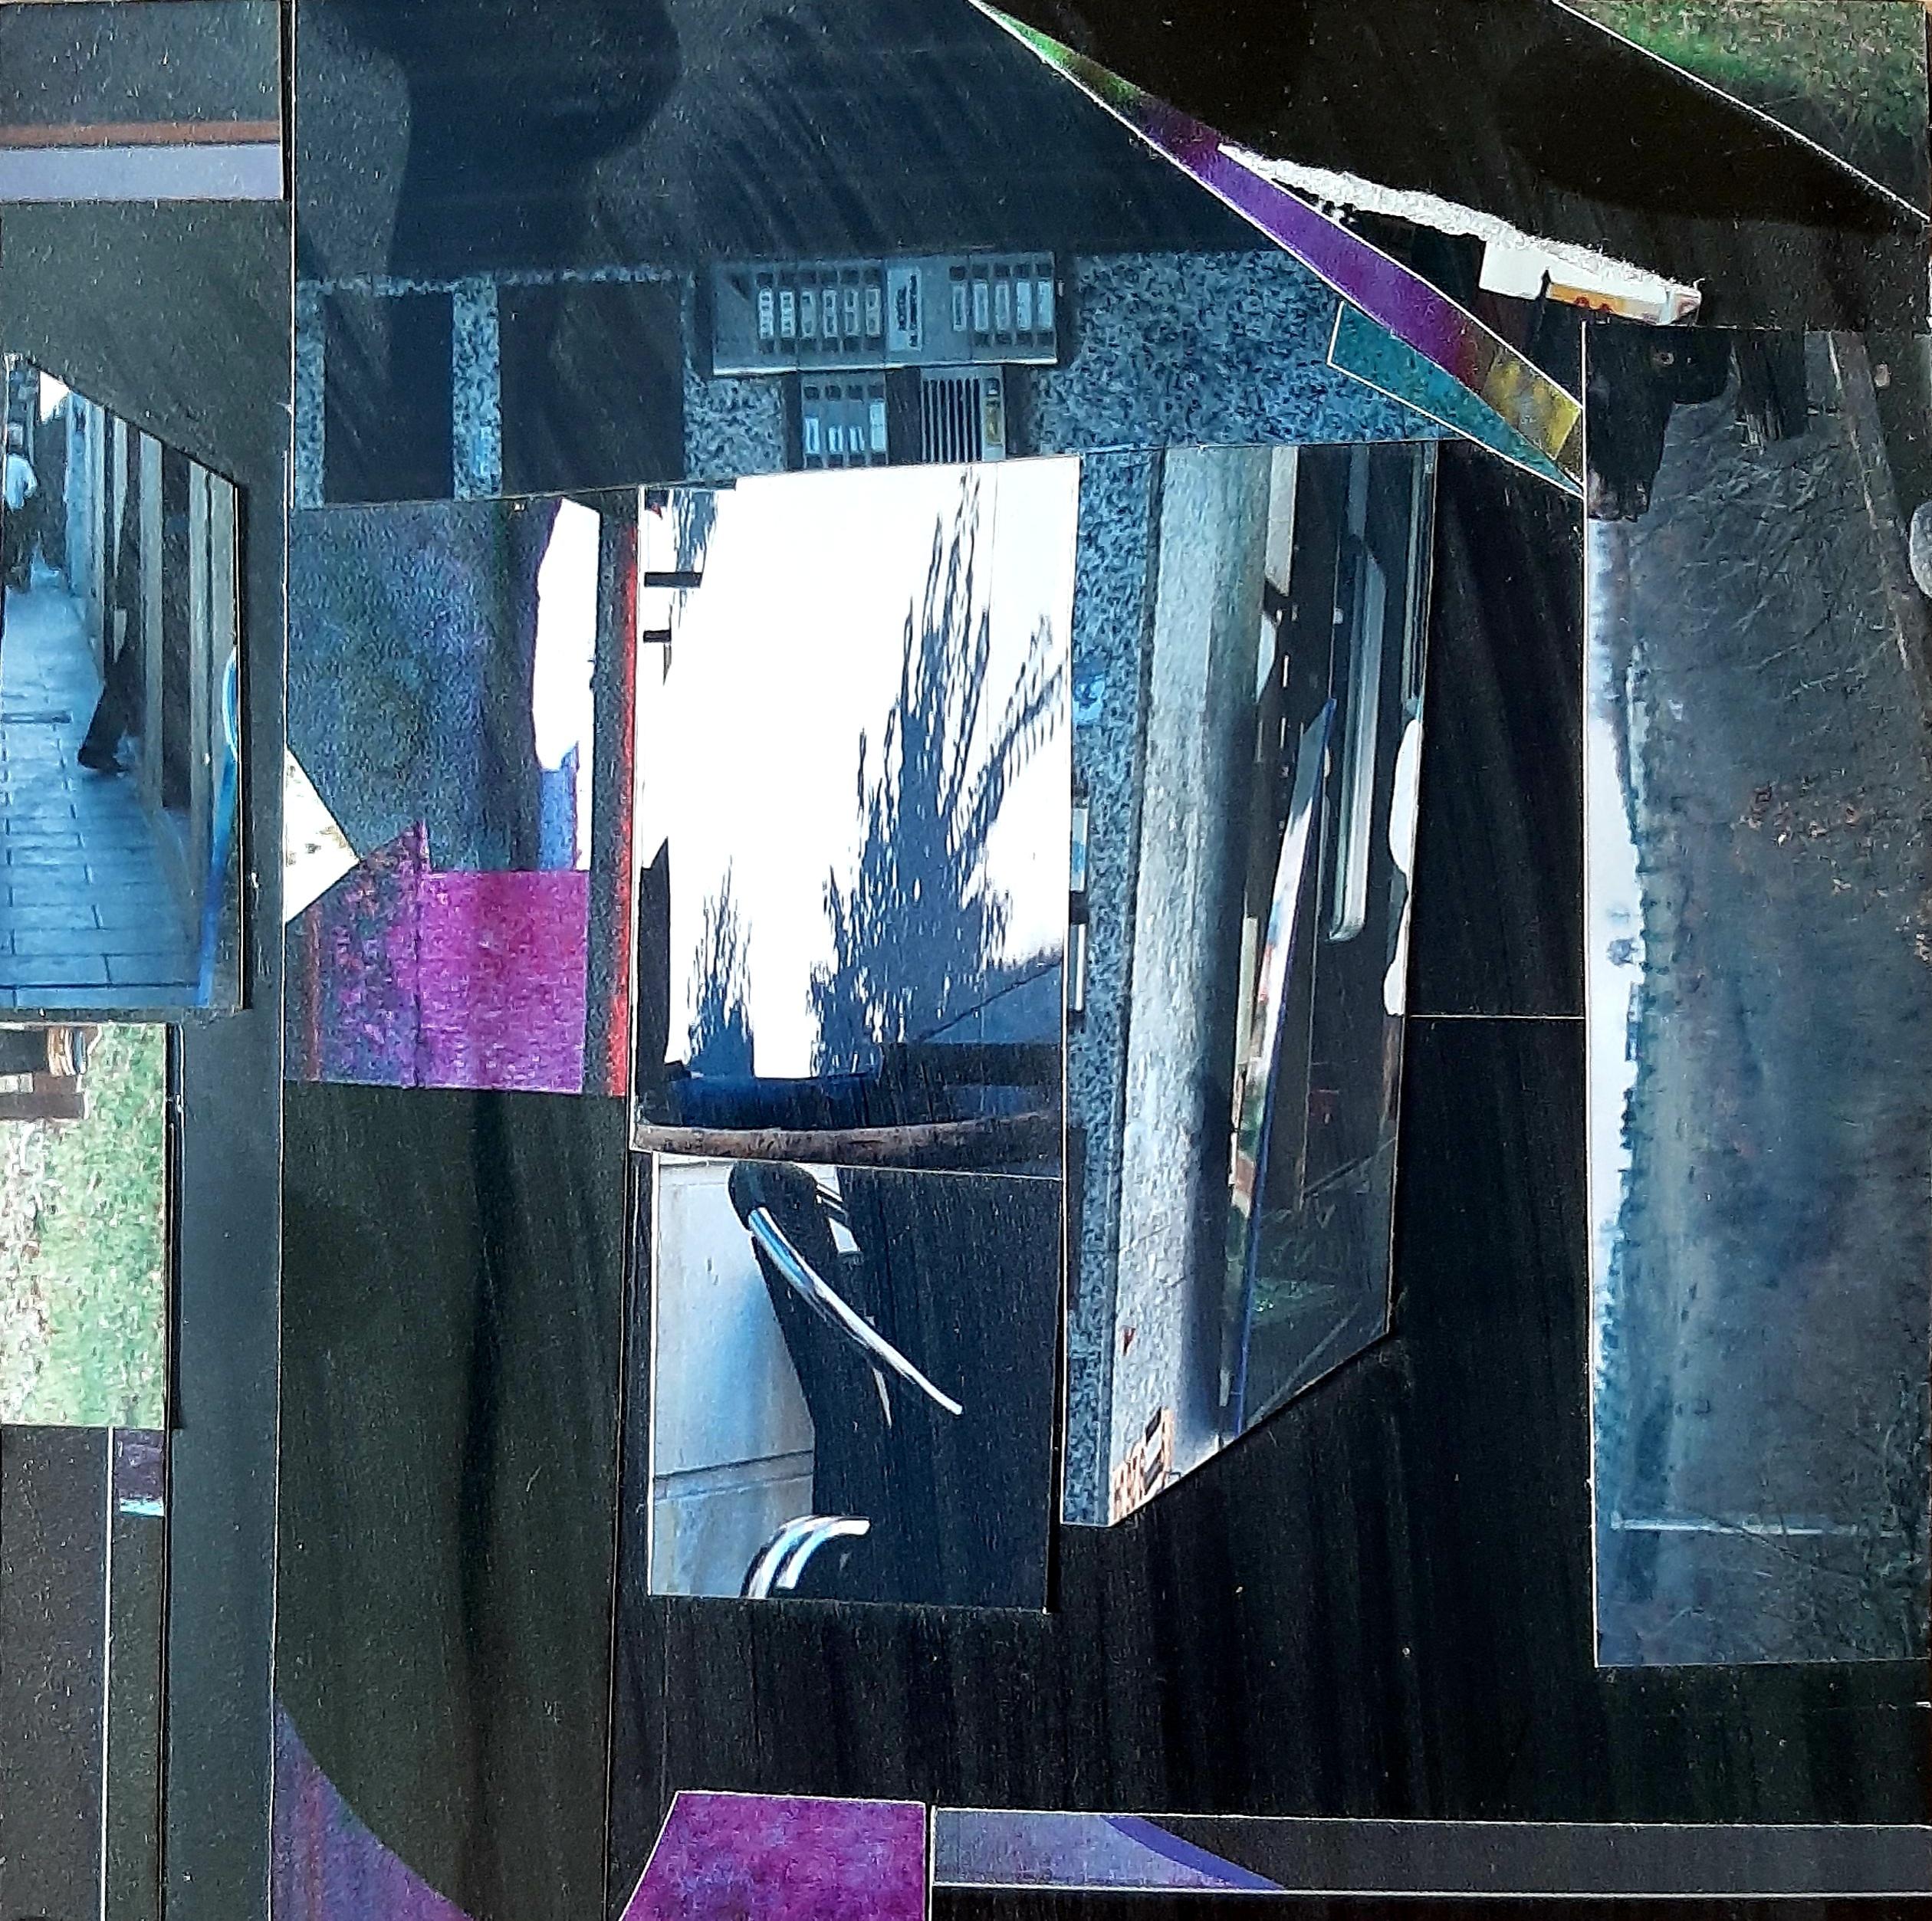 Marie Laure Colasson 17x17 cm collage 2021